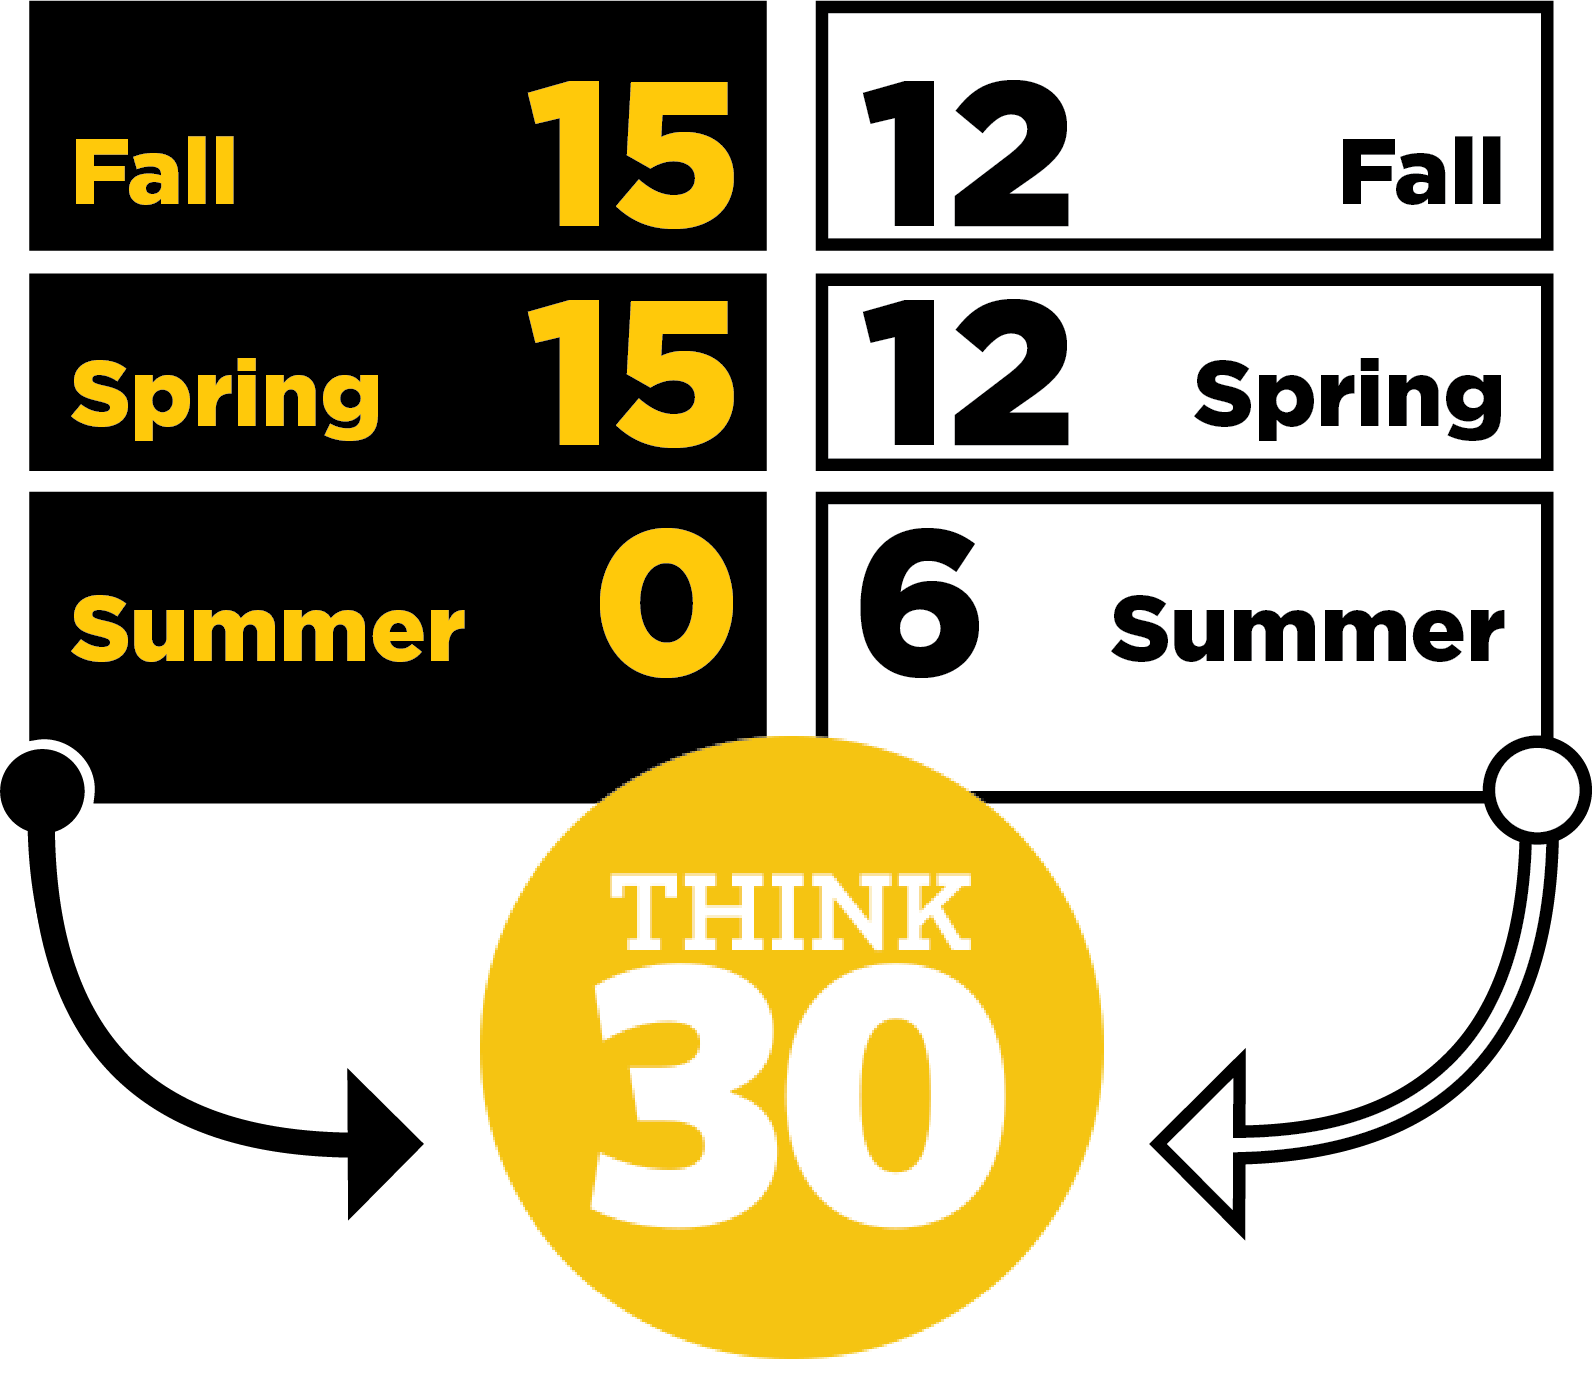 Think 30 Fall, Spring, Summer chart